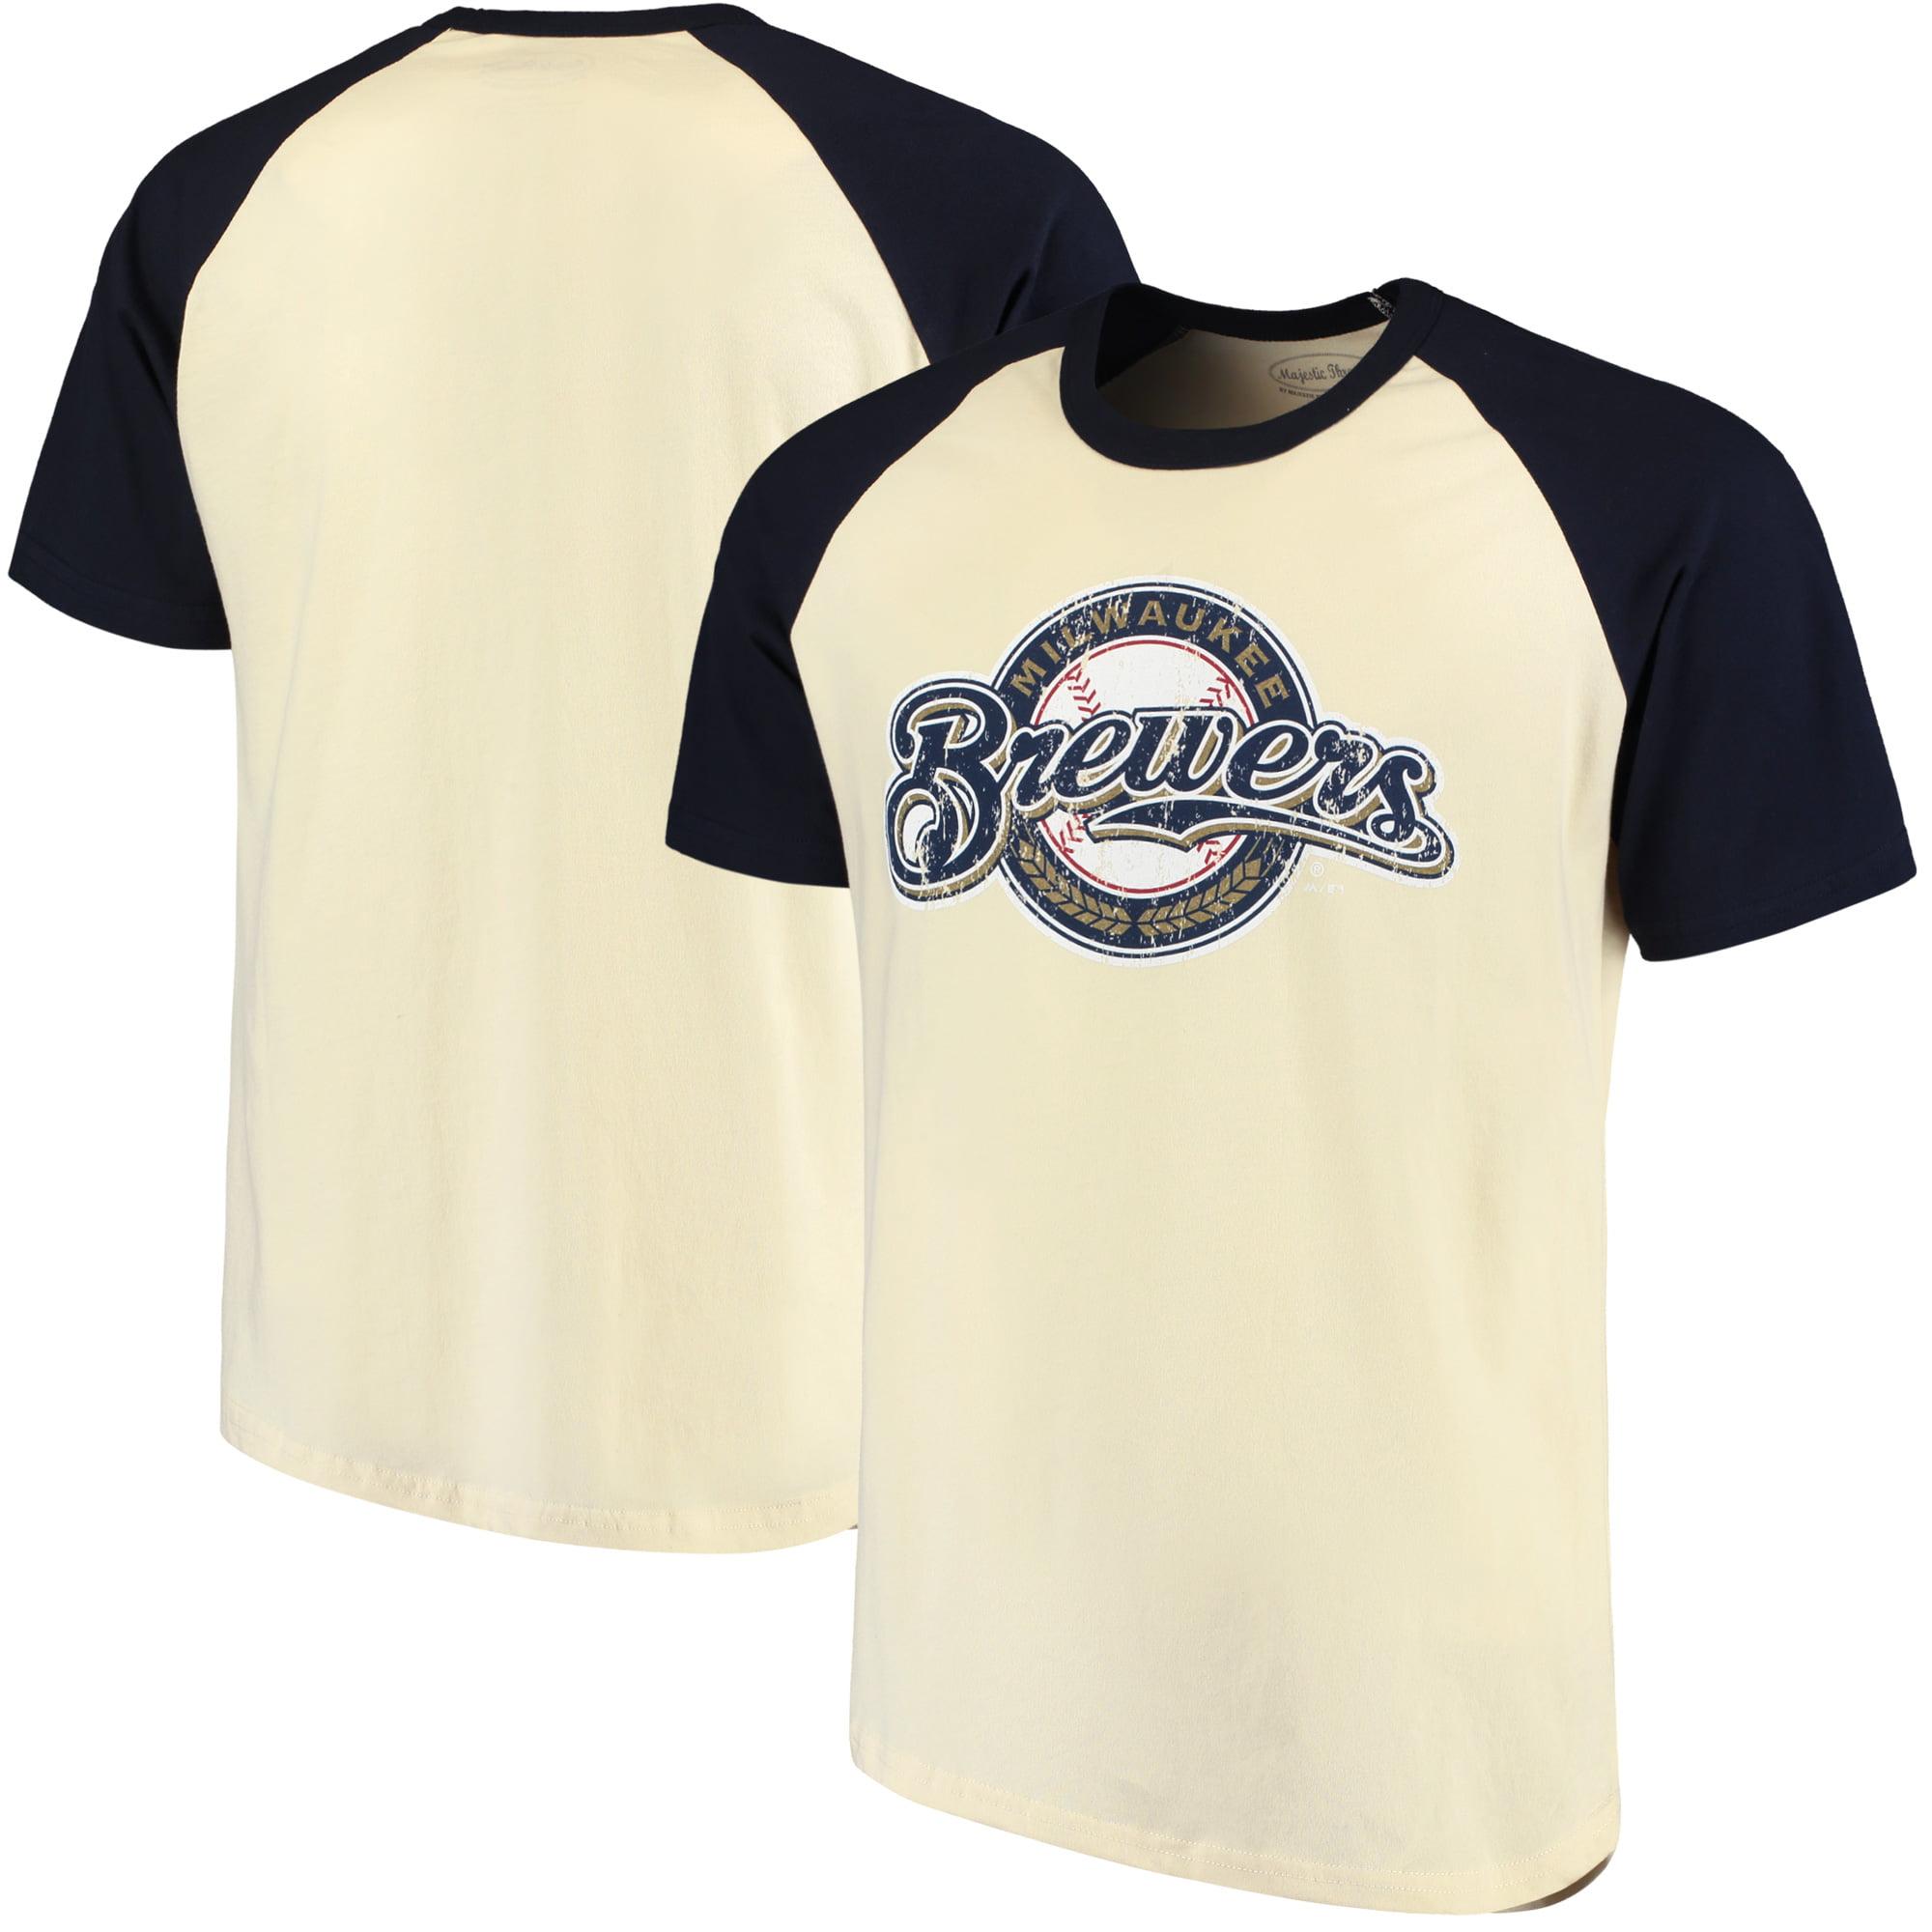 Milwaukee Brewers Majestic Threads Softhand Raglan T-Shirt - Cream/Navy